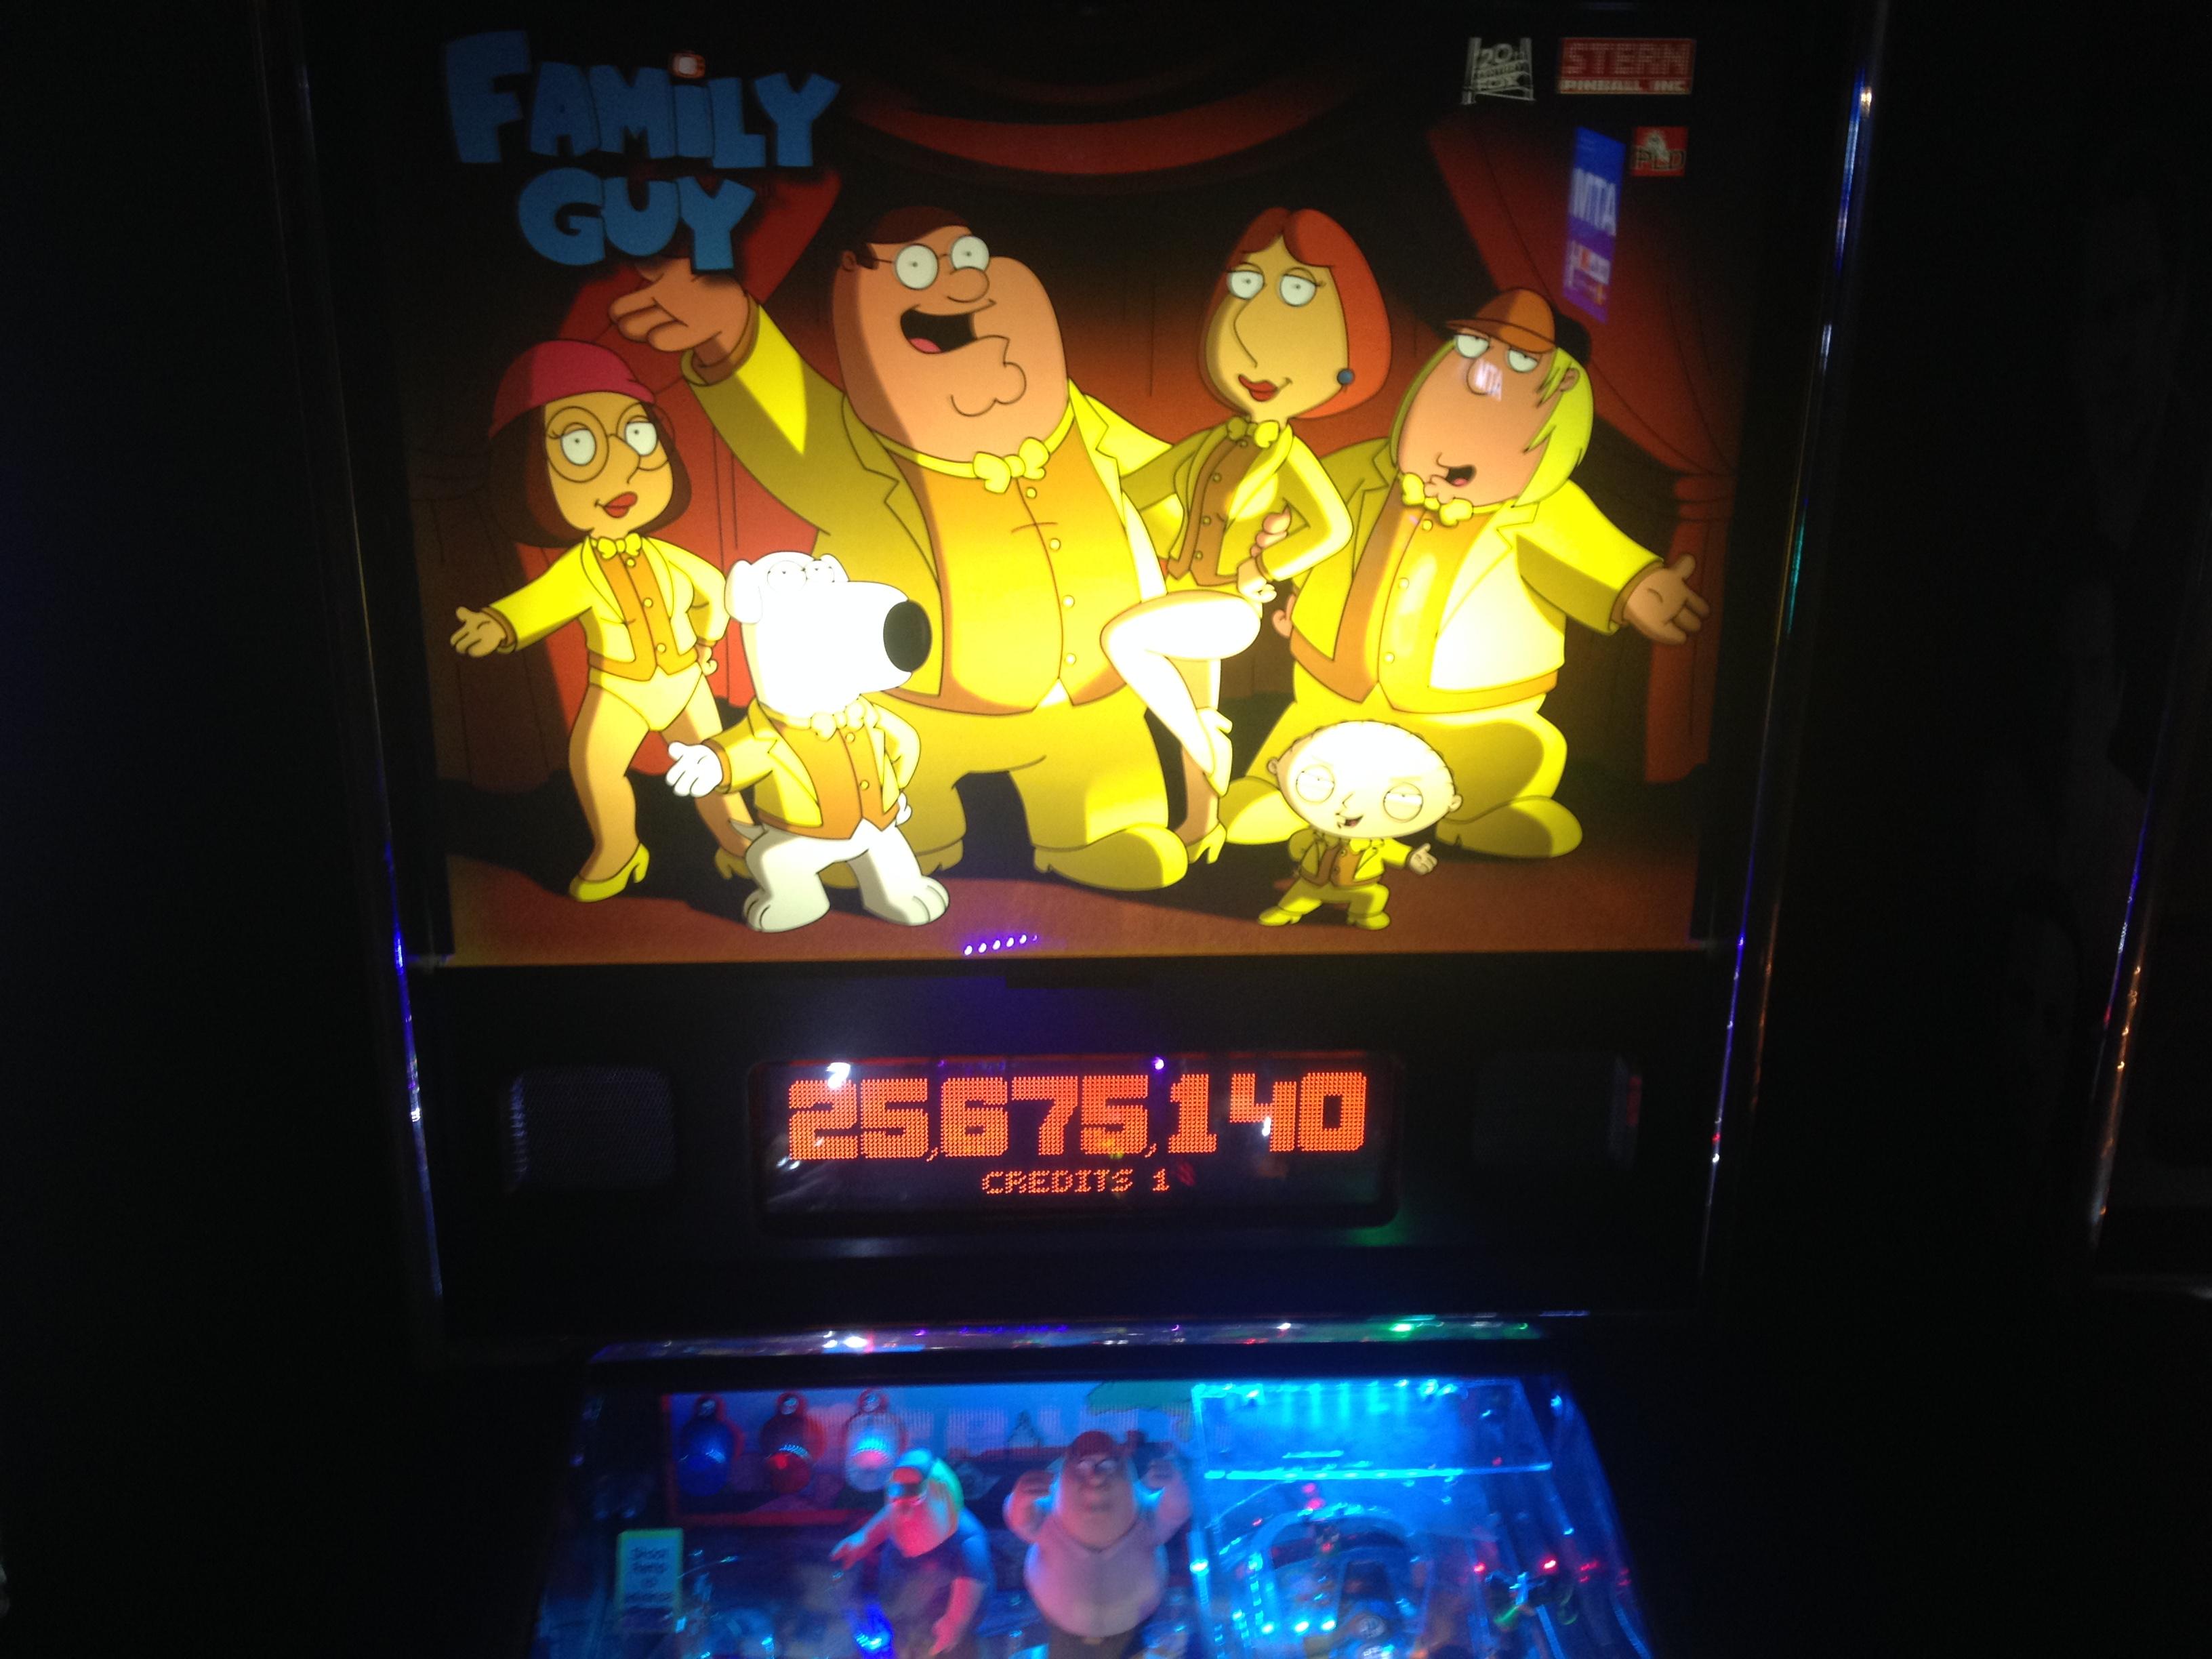 FosterAMF: Family Guy (Pinball: 3 Balls) 25,675,140 points on 2014-11-26 14:08:25